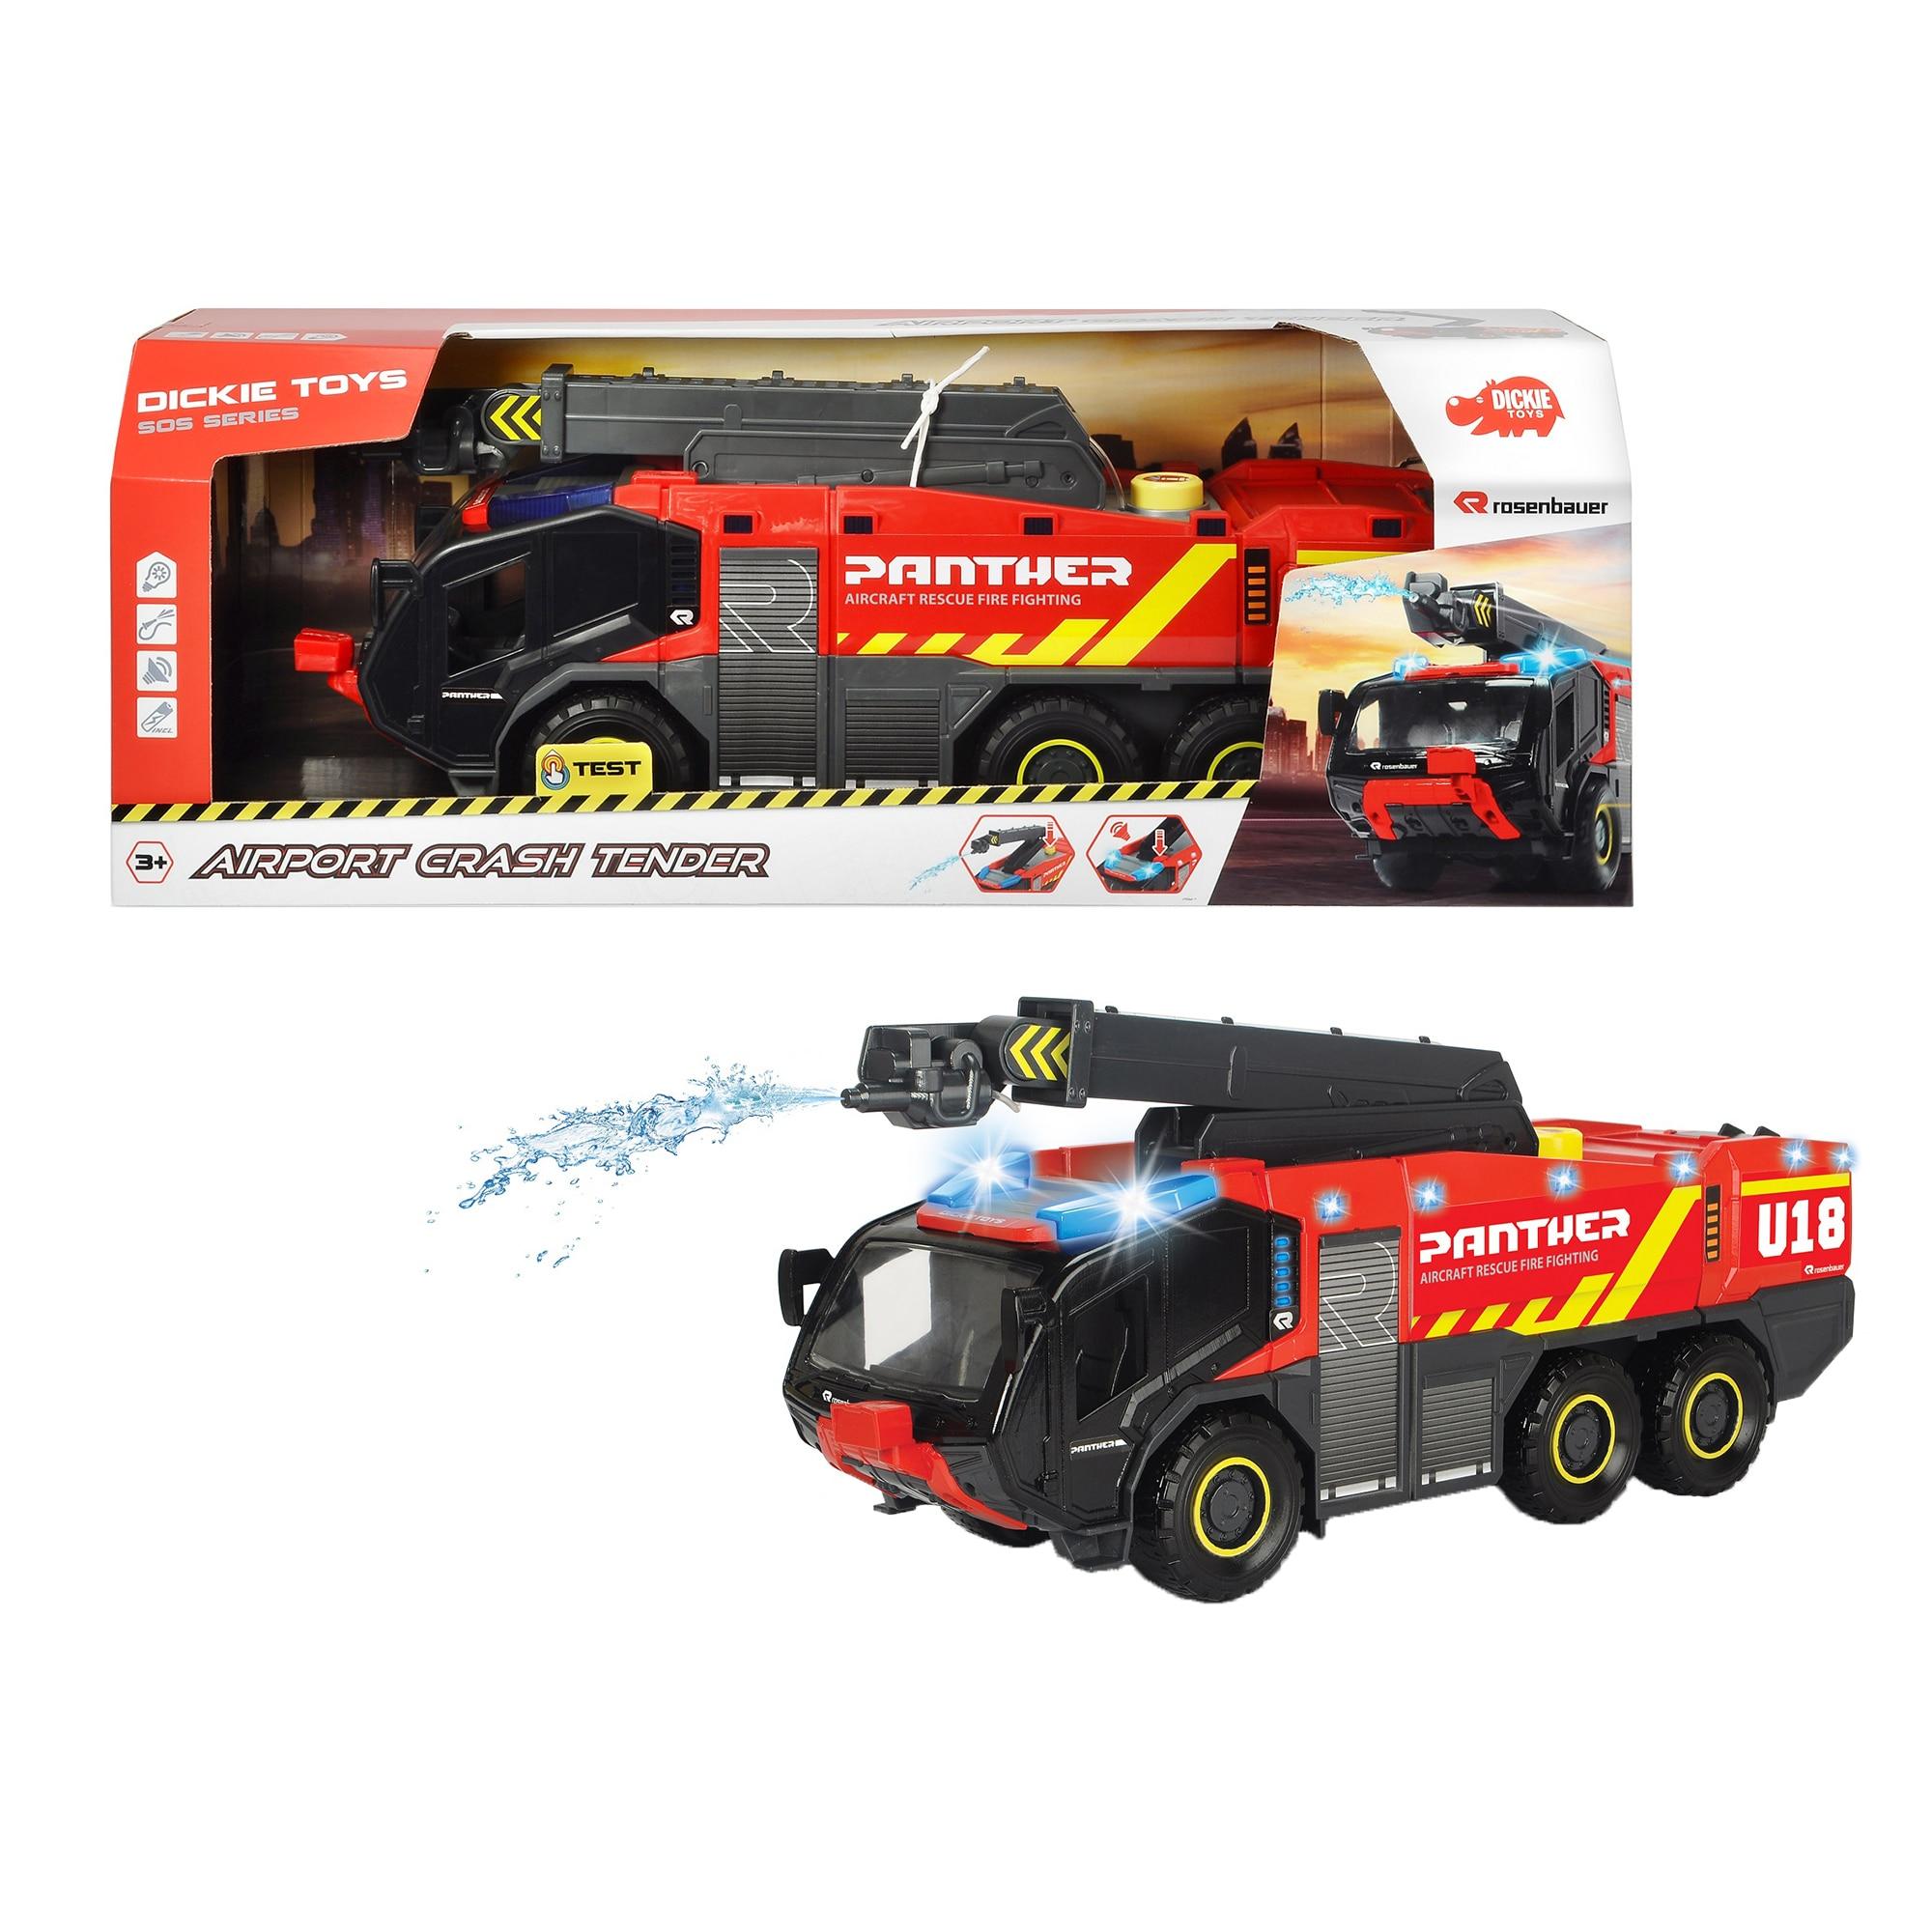 Fotografie Masina de pompieri Dickie Toys - Airport crash tender, 62 cm